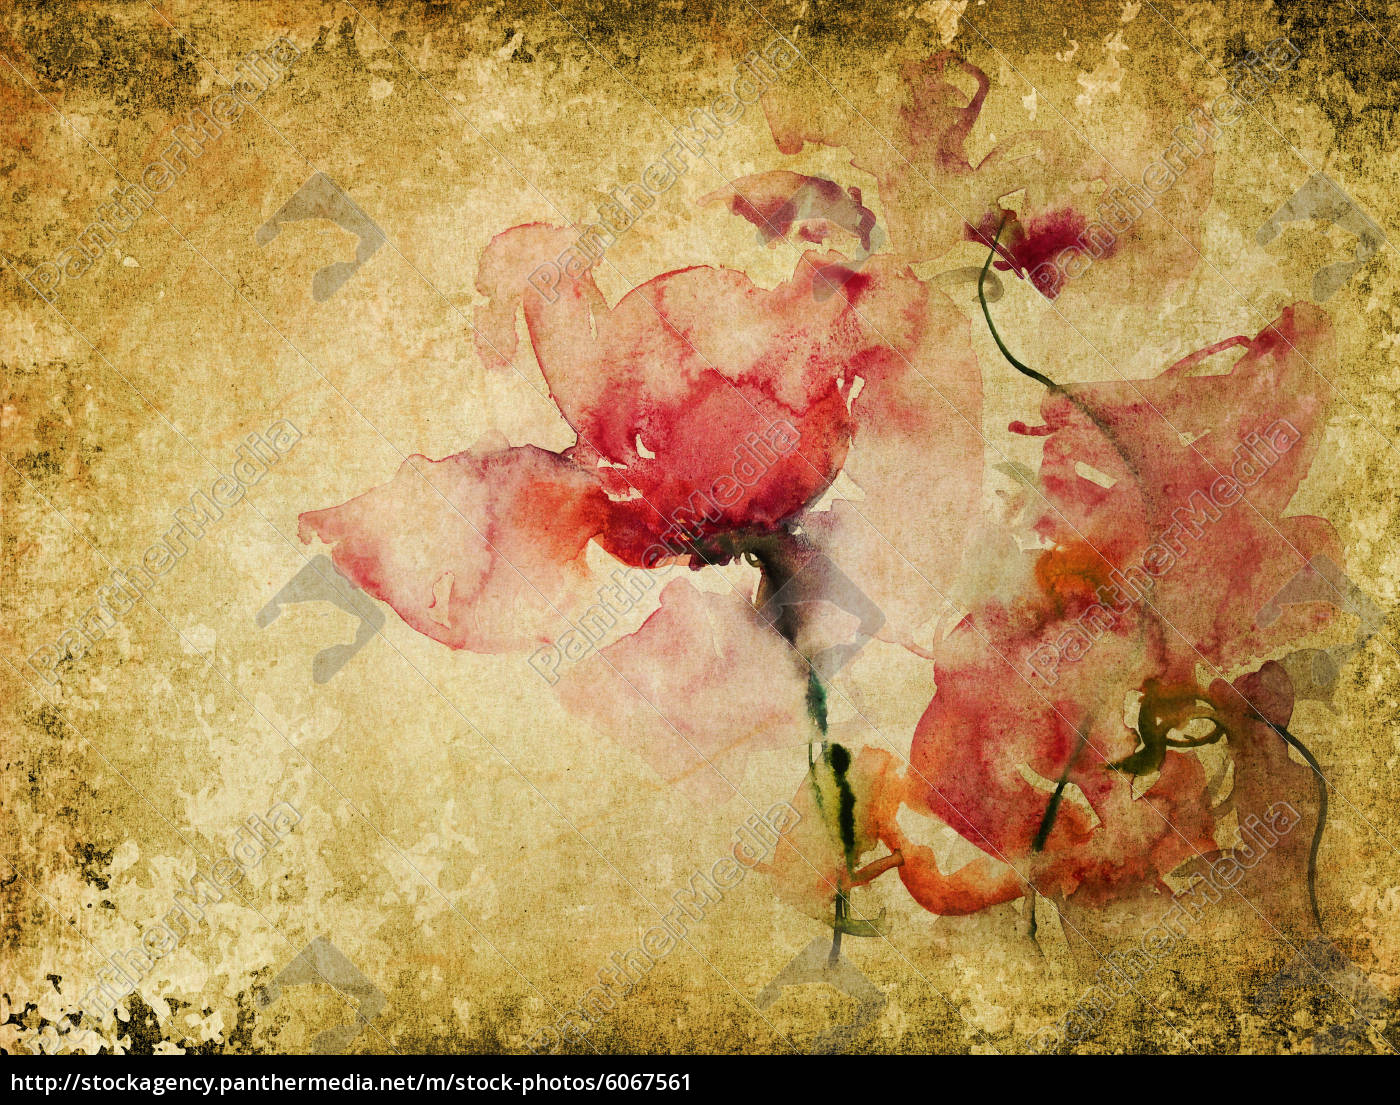 Https M Stock Photos 6058031 Senior The Wetbrush Watercolor Mossaics Starburst Roses Parchment Retro 06067561 High